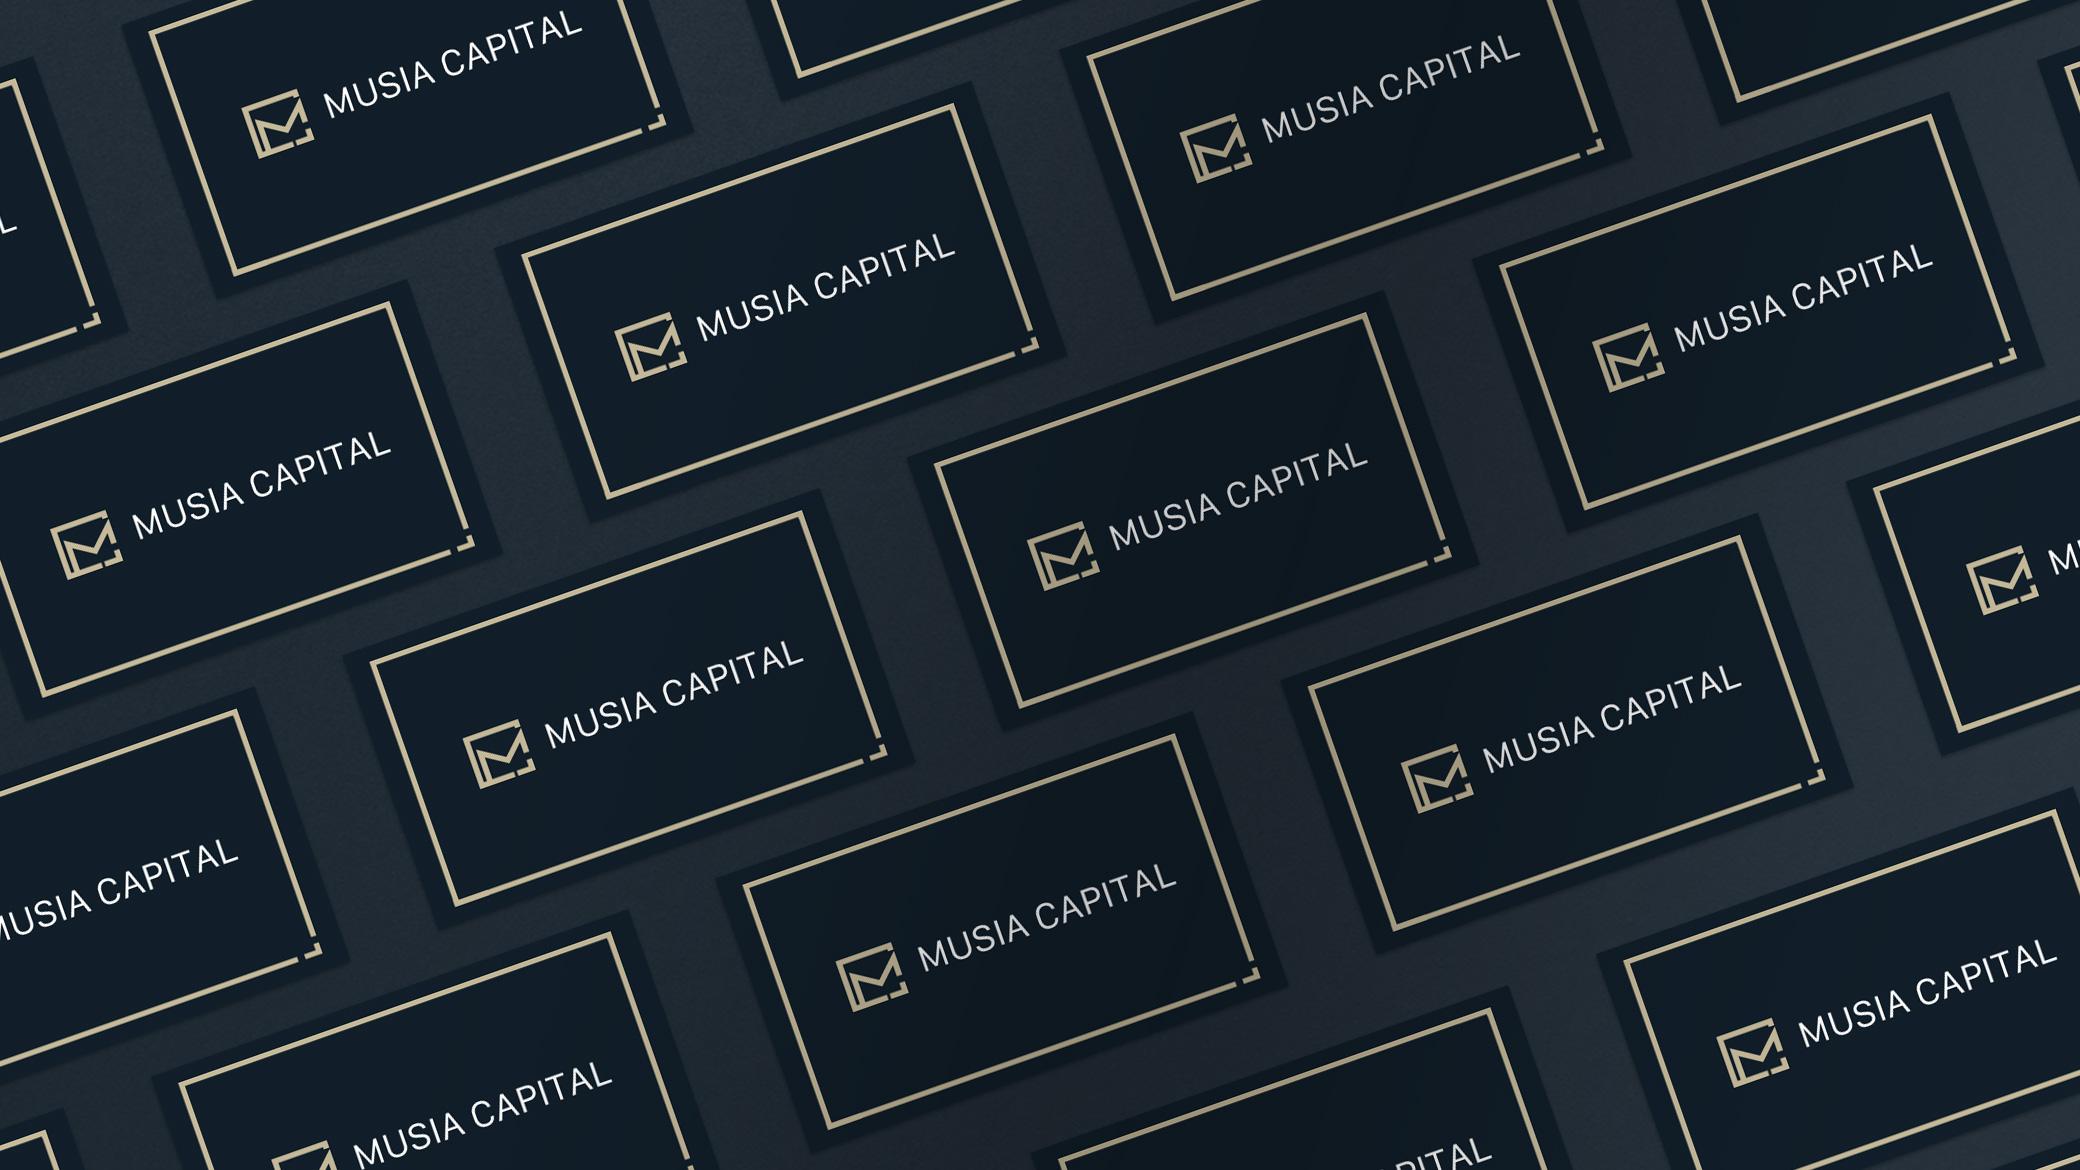 Musia Capital name card